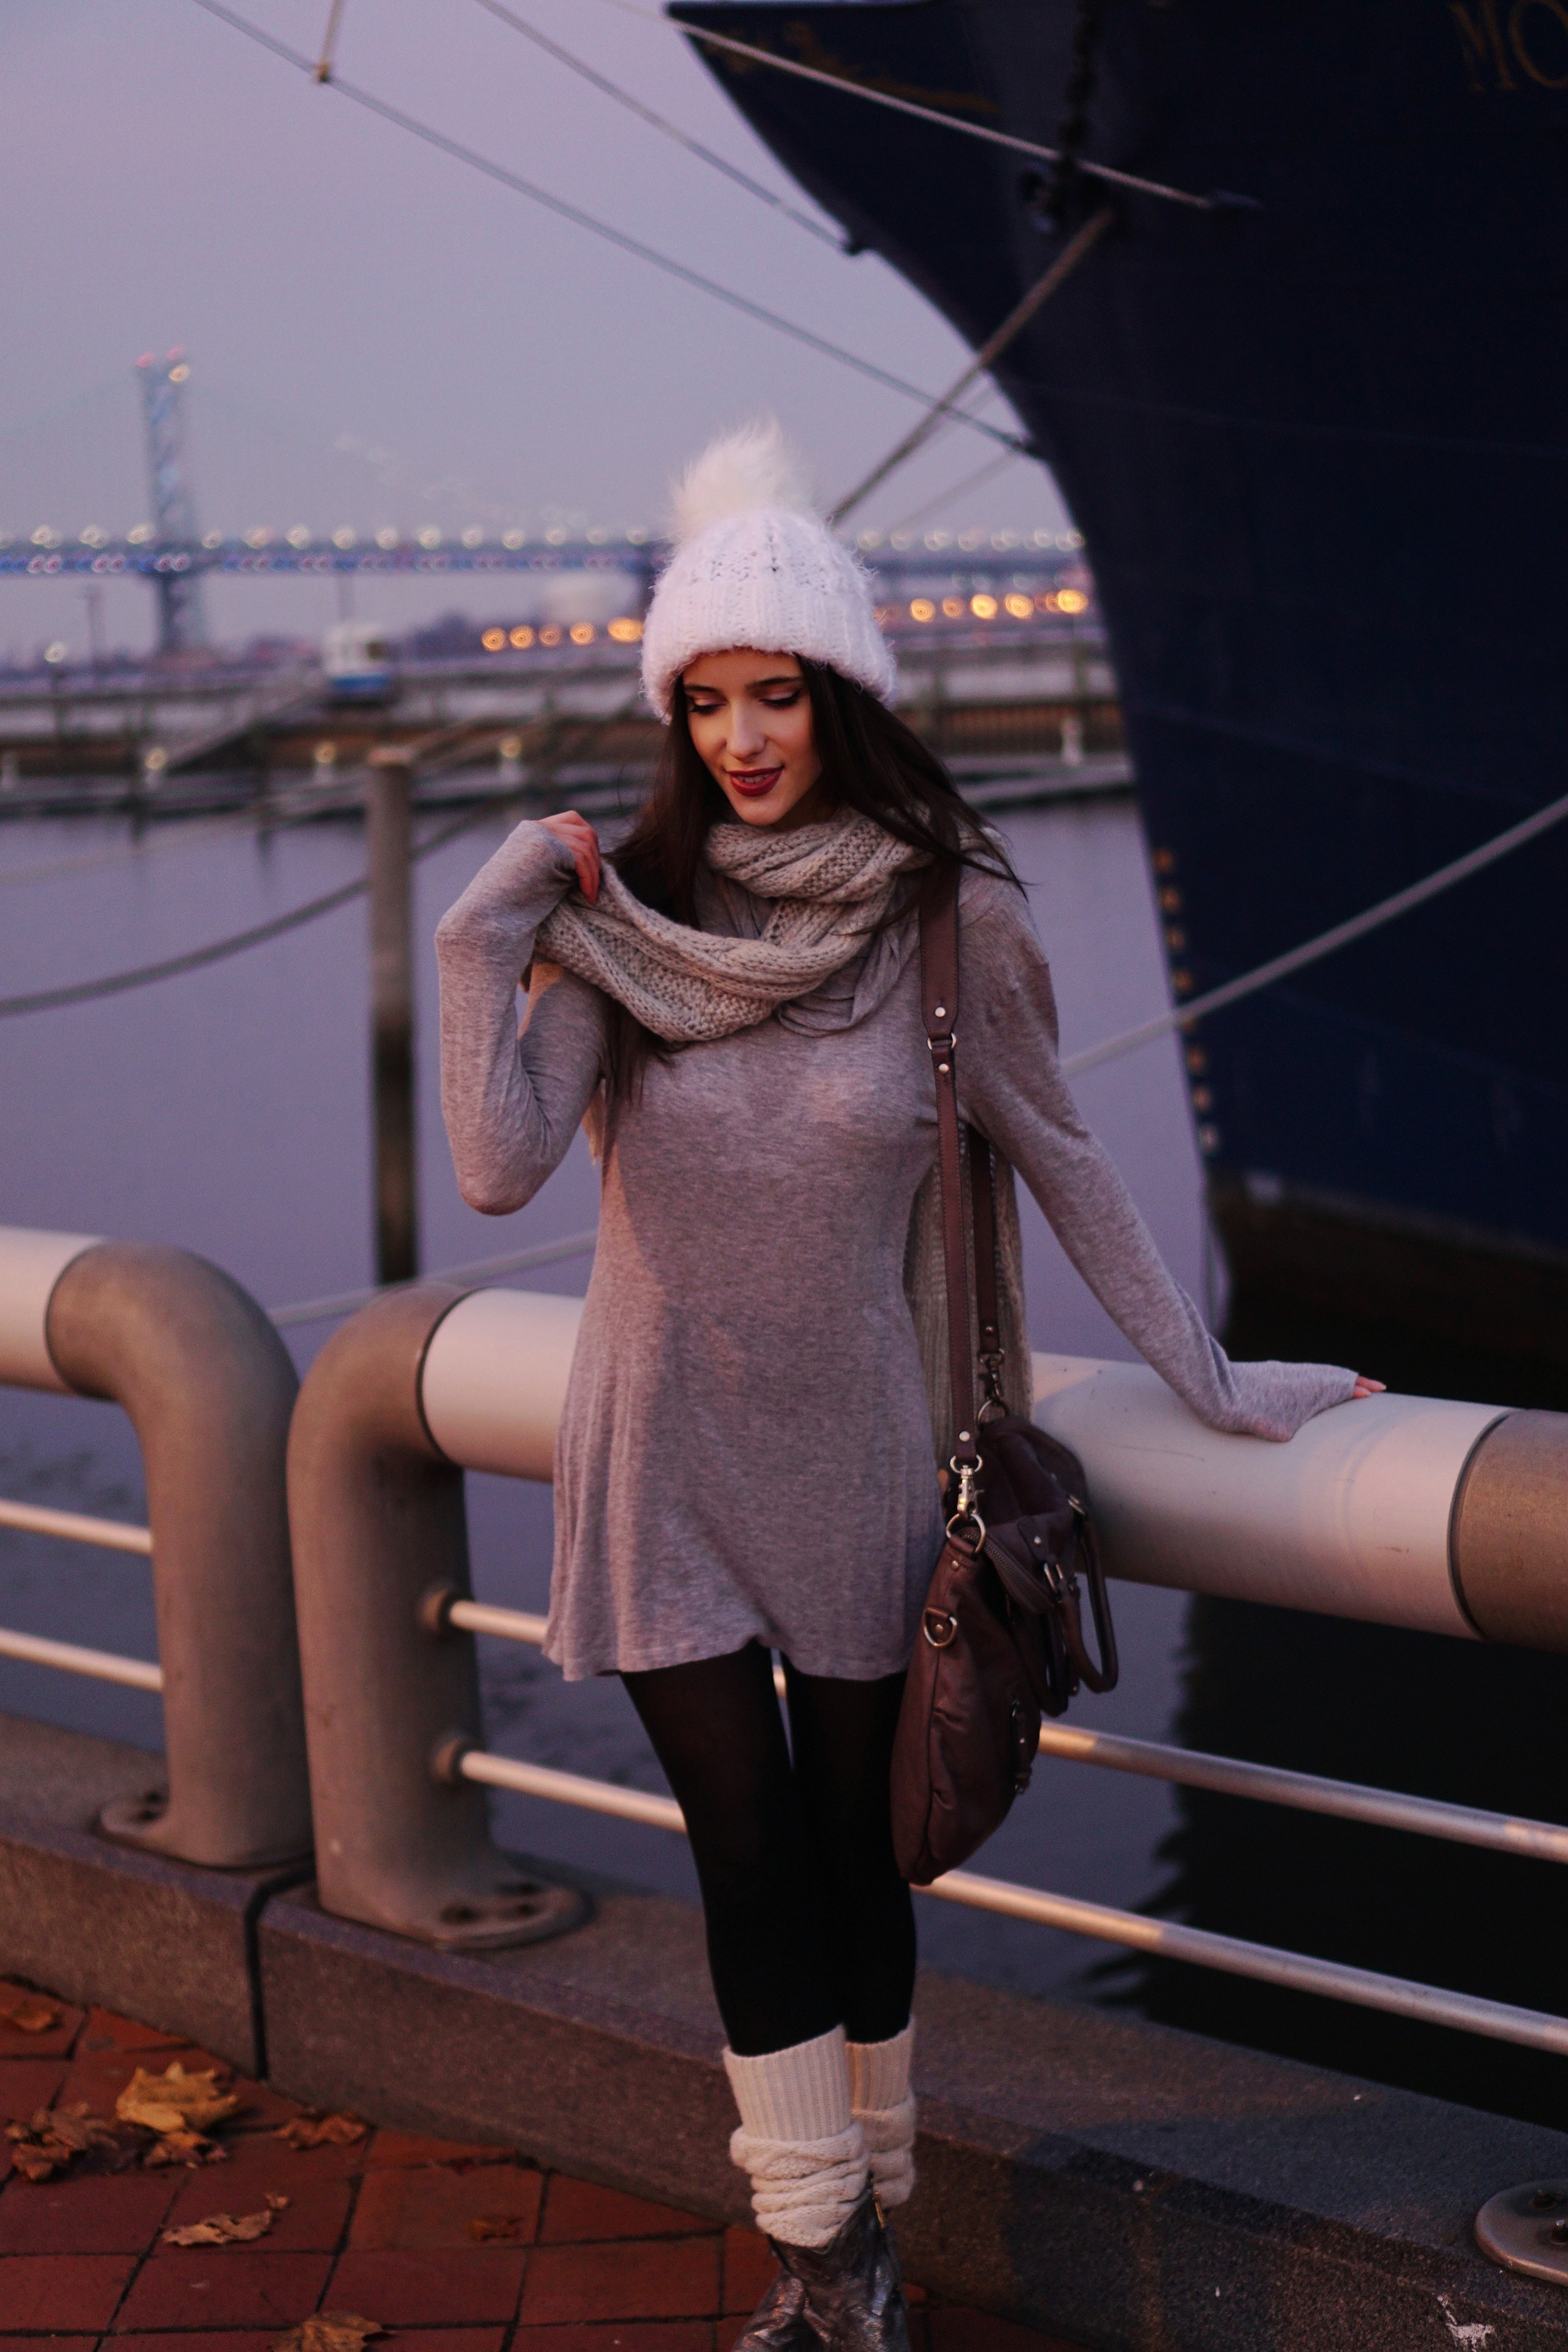 hat:  my design  | choker:  diy  | tunic:  n/a  | tights:  n/a  | legwarmers:  n/a  | boots:  free people  | bag:  urban outfitters  | scarf:  n/a